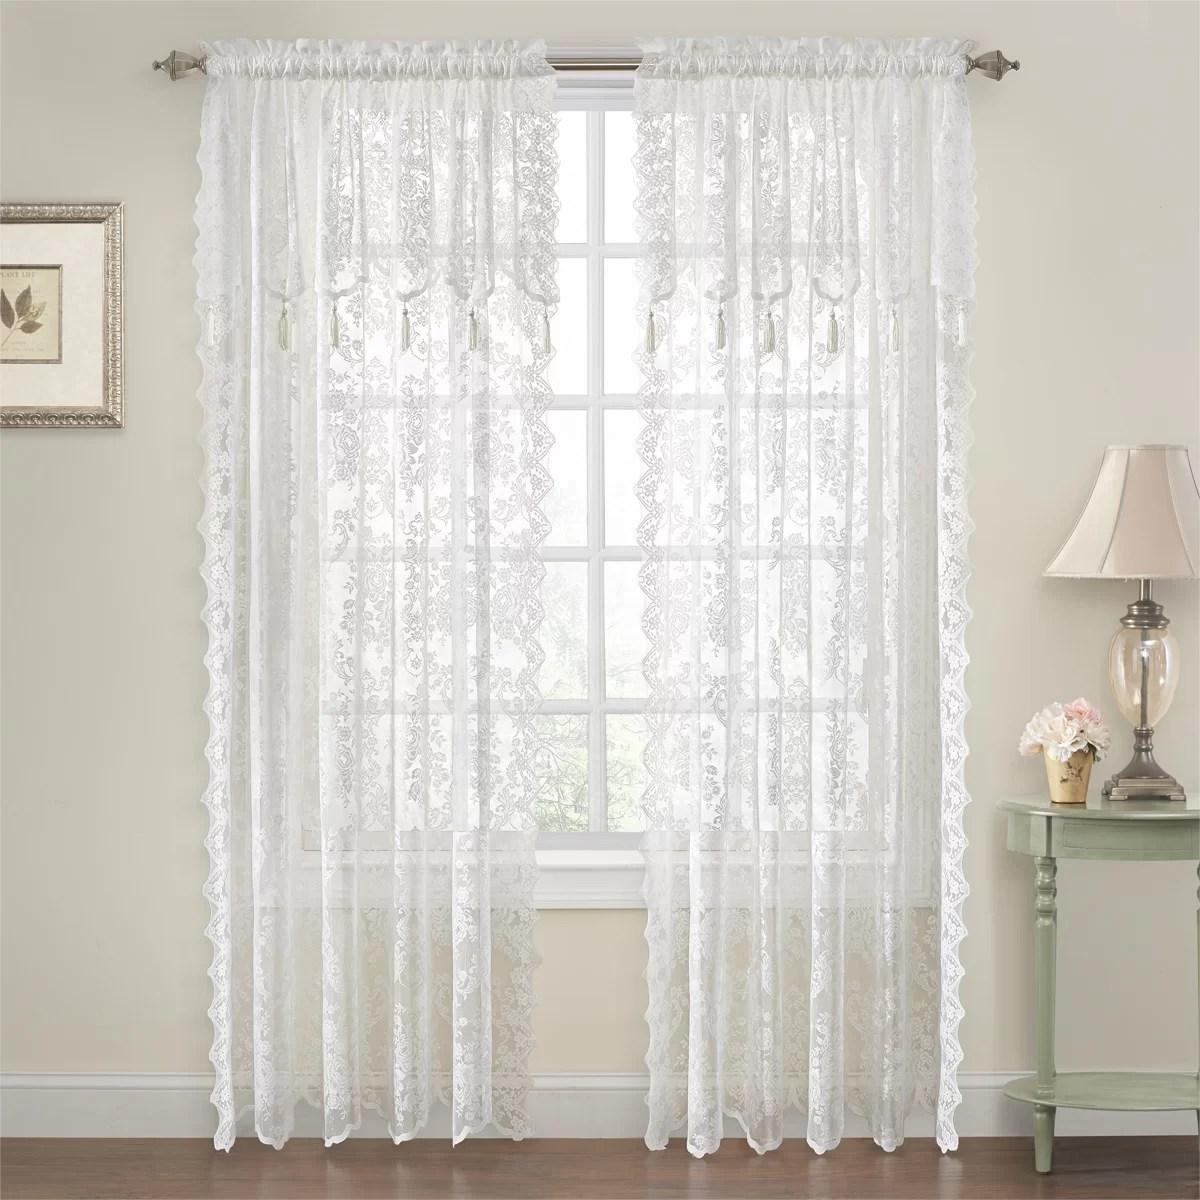 Astoria Grand Roxann Elegance Lace Floral Semi Sheer Rod Pocket Curtain Panels Reviews